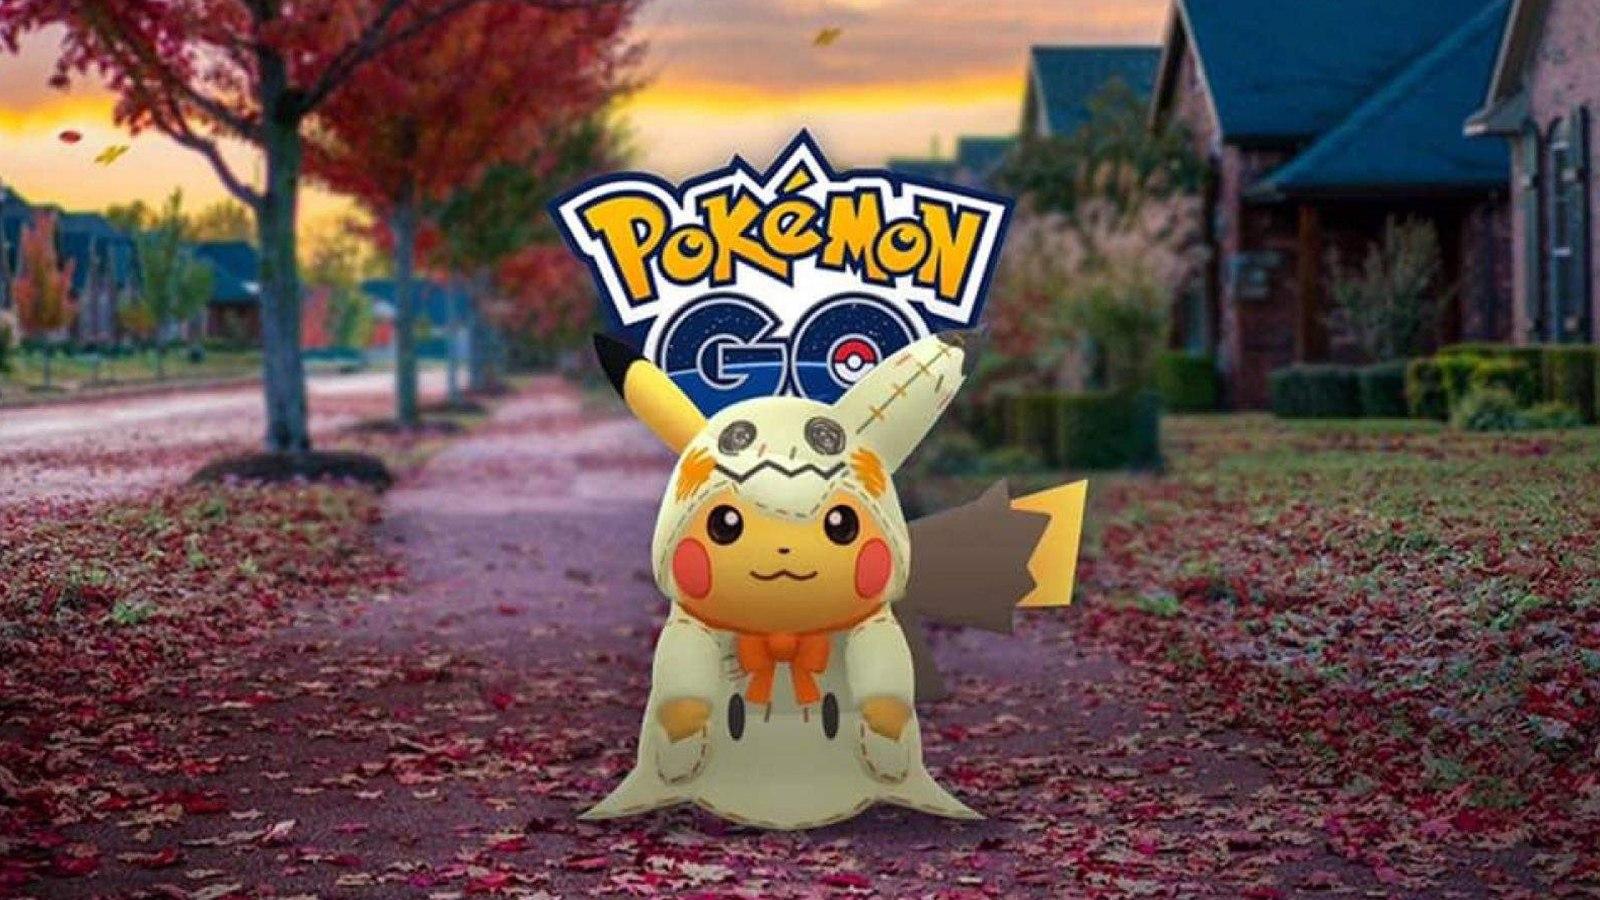 Evénement Halloween sur Pokémon Go